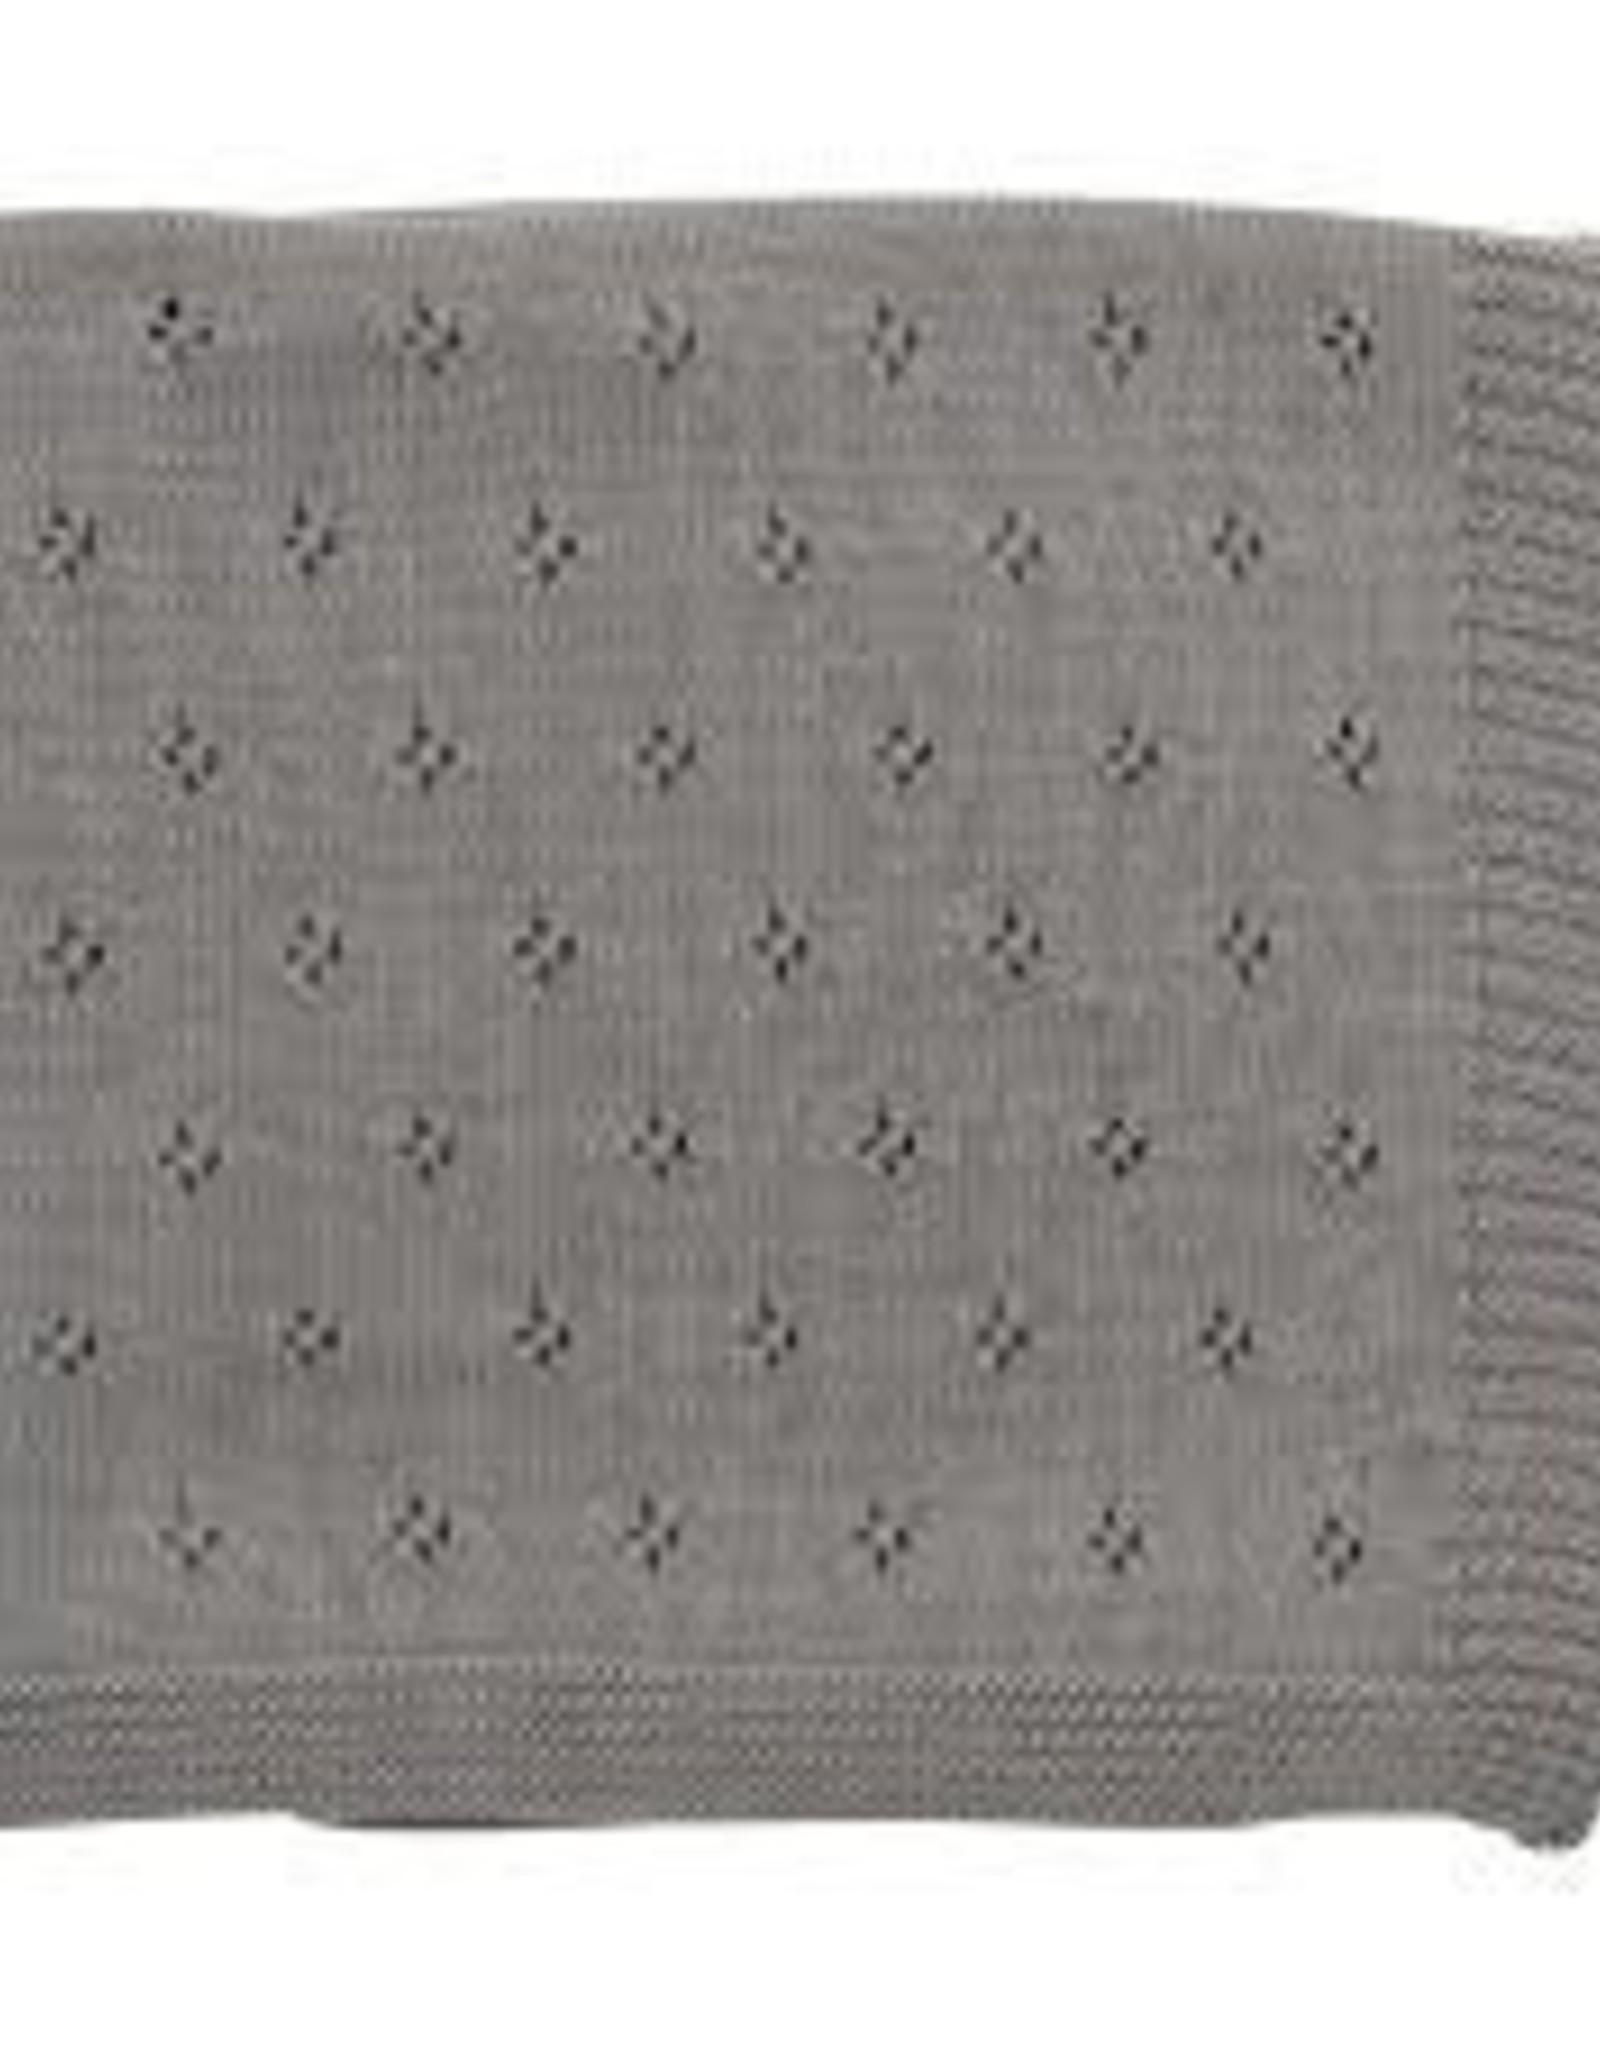 Zestt Clover Knit Baby Blanket